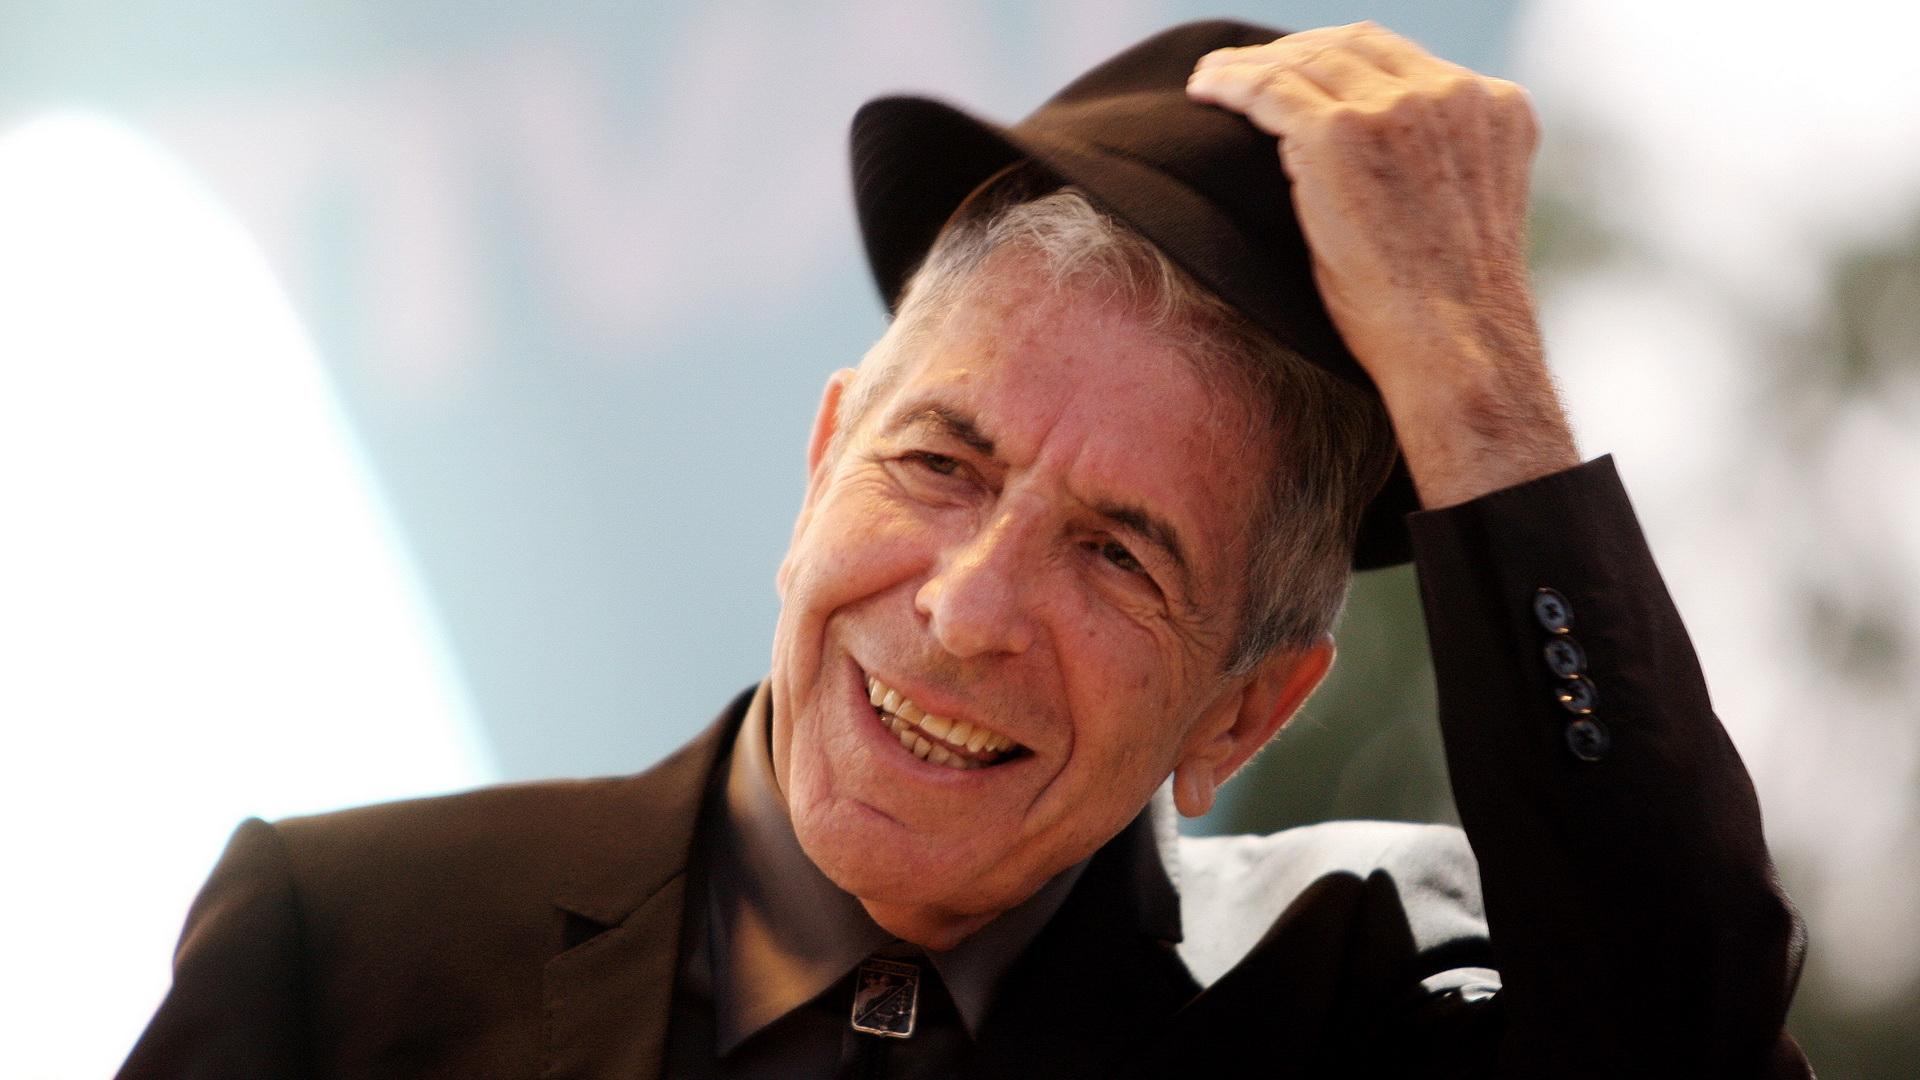 Leonard Cohen backdrop wallpaper